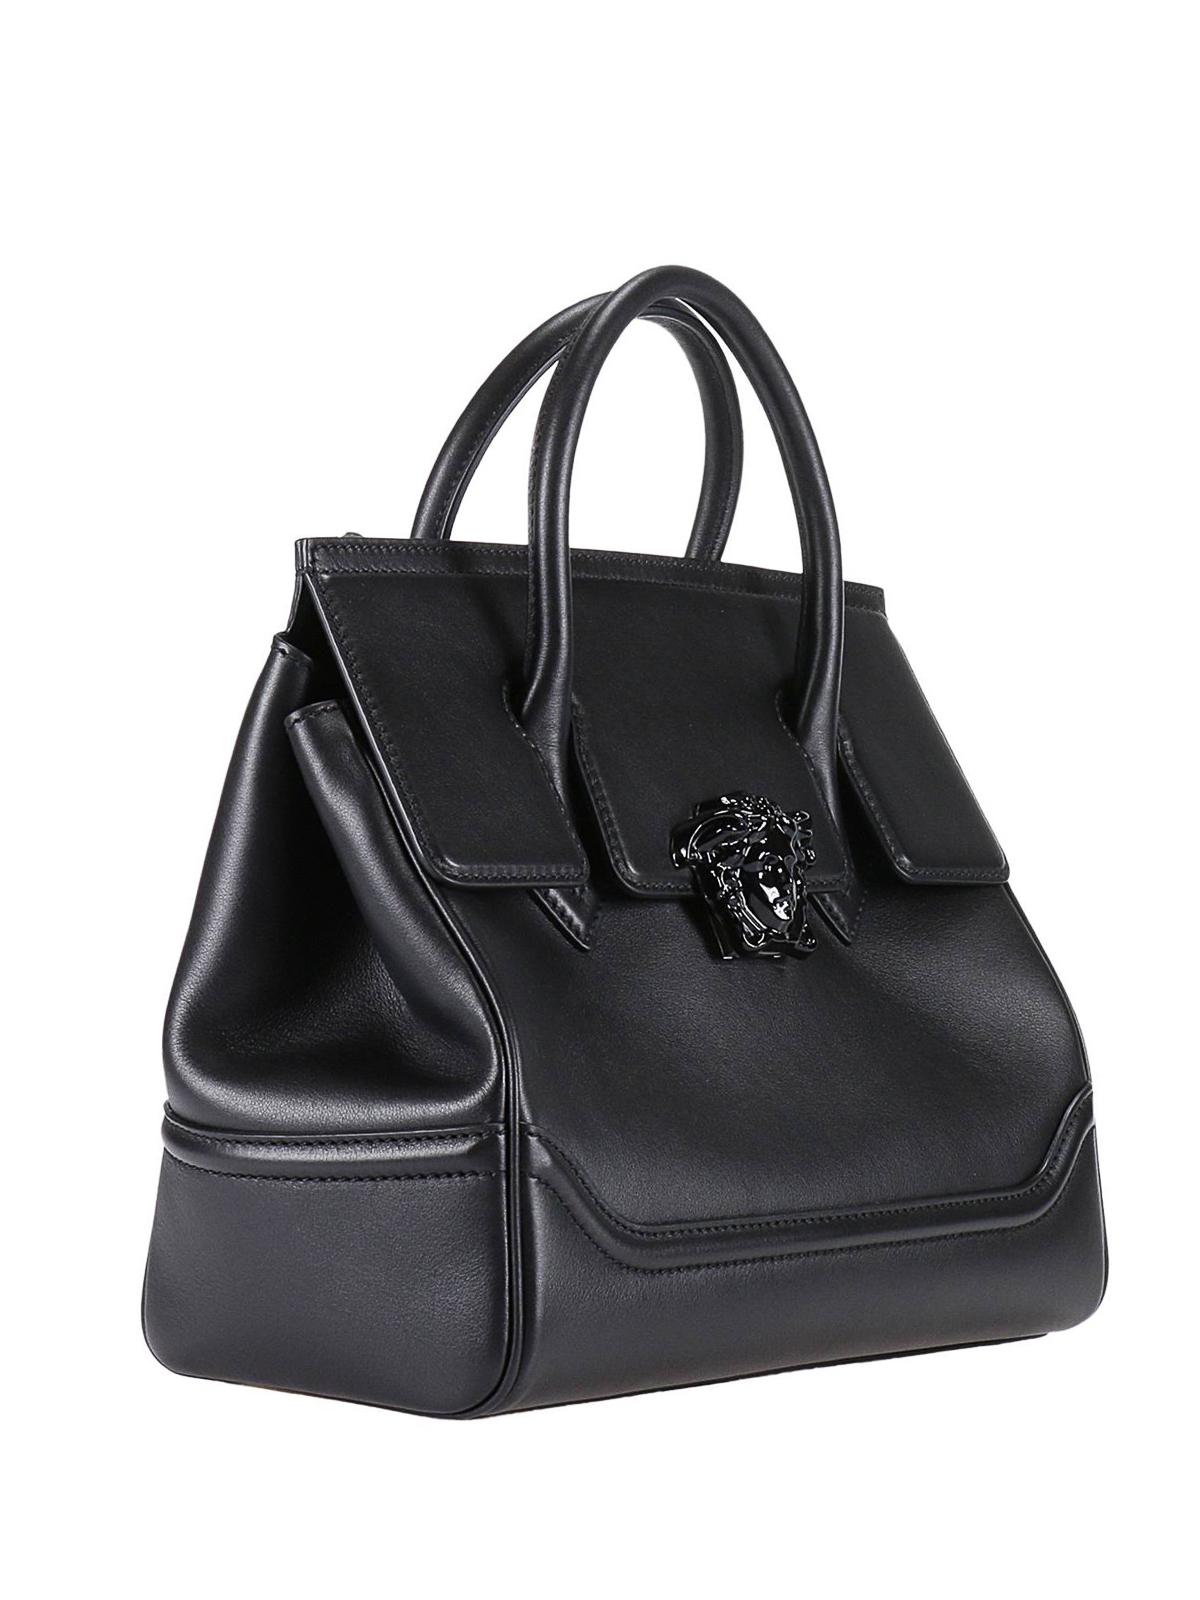 9d4b8ff16fef Versace - Palazzo Empire large bag - bowling bags - DBFF453NDSTVTKNJP